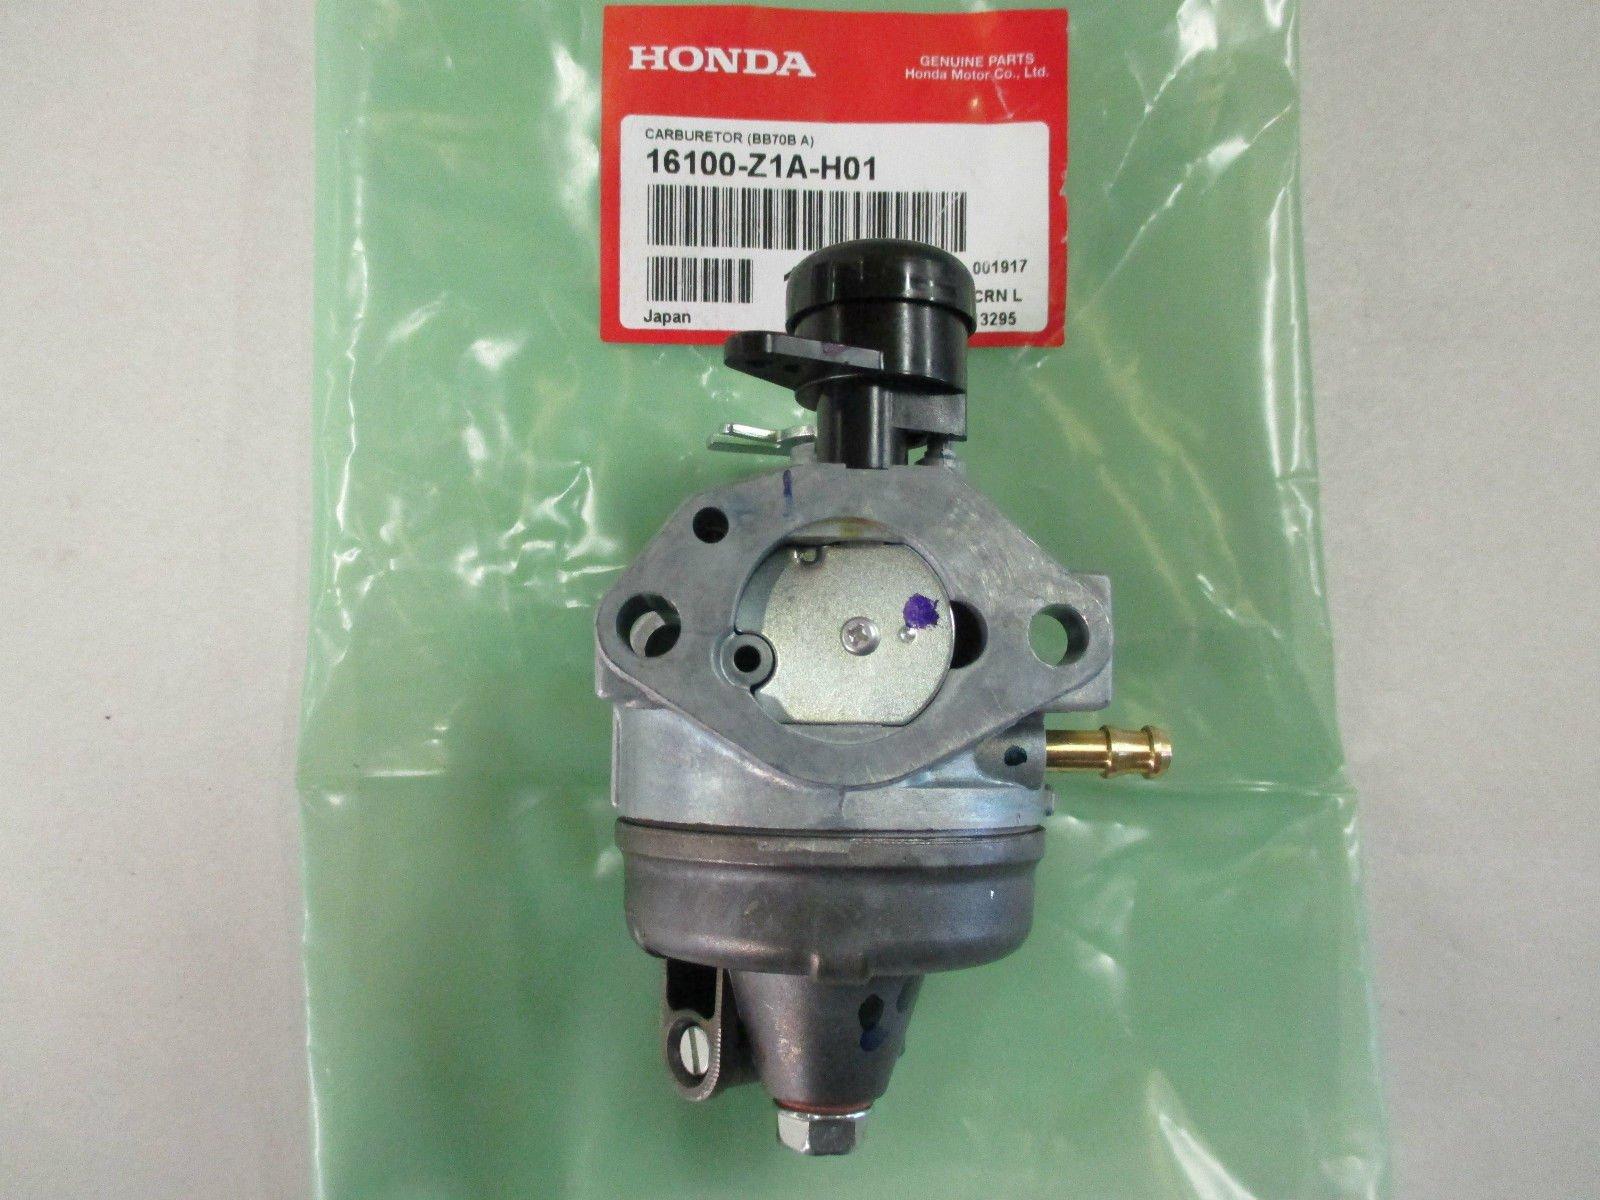 Honda 16100-Z1A-H01 Snow Blower Carburetor (BB70B A) by Honda